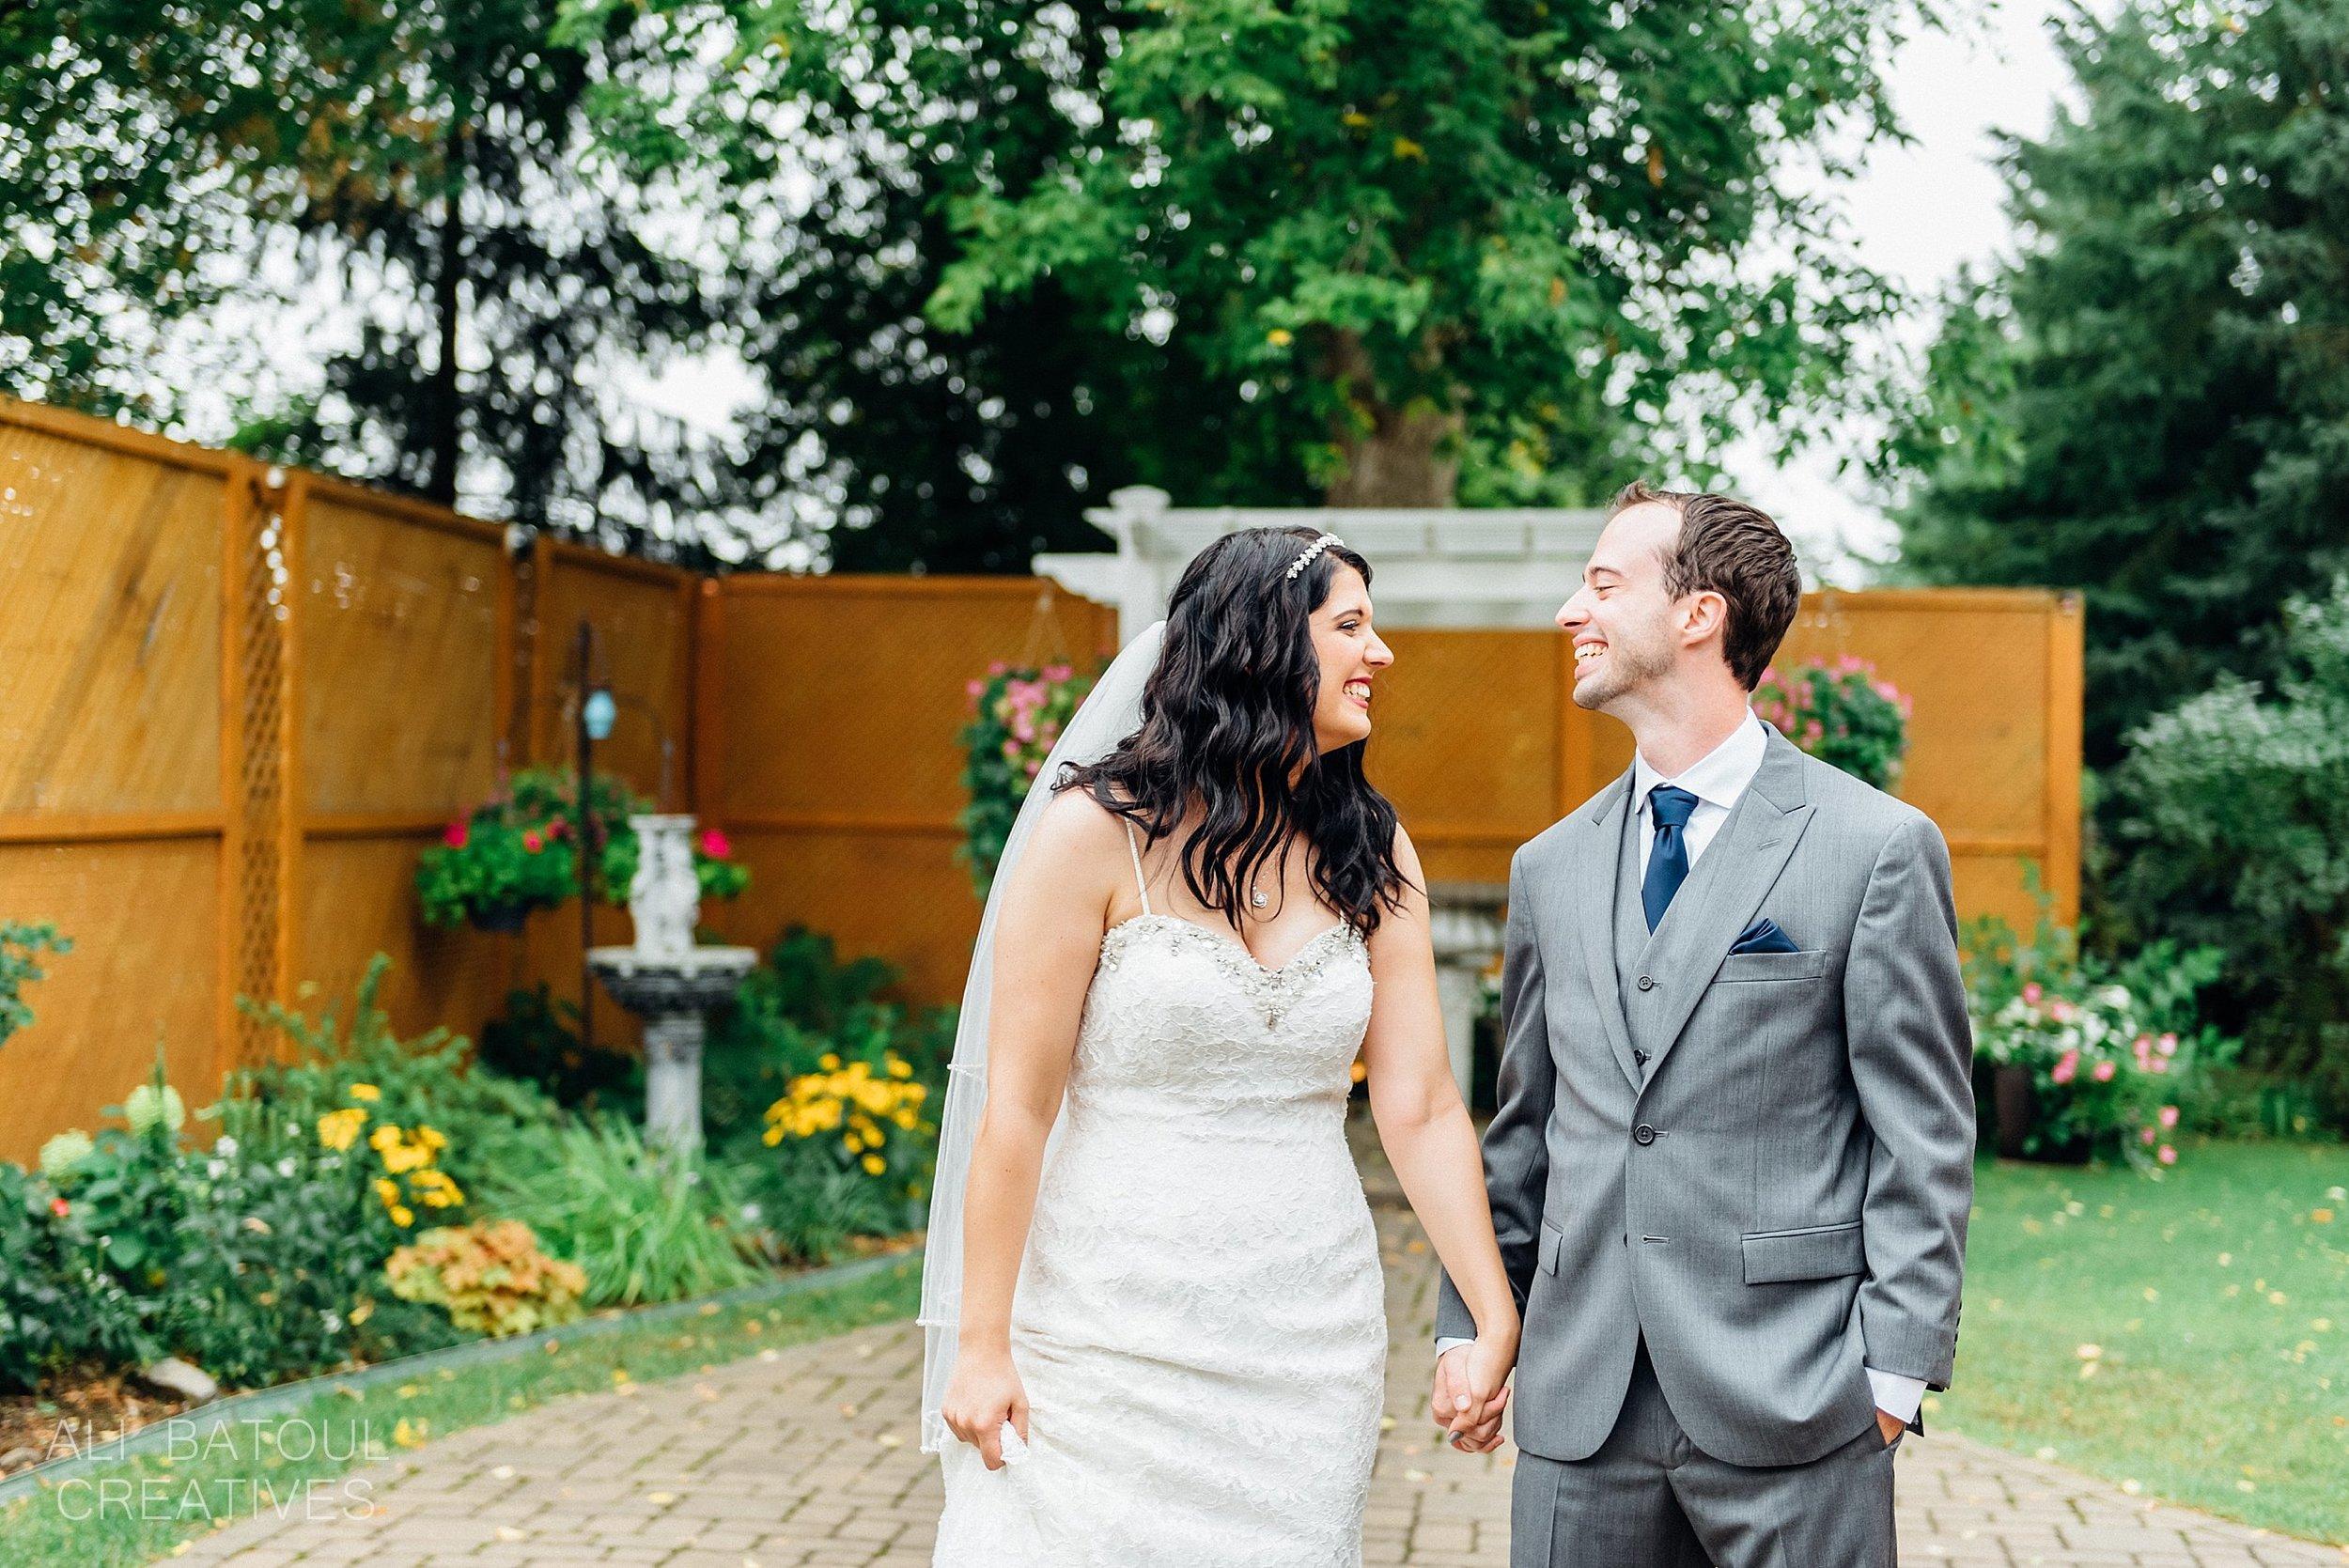 Jocelyn + Steve At The Schoolhouse Wedding - Ali and Batoul Fine Art Wedding Photography_0031.jpg